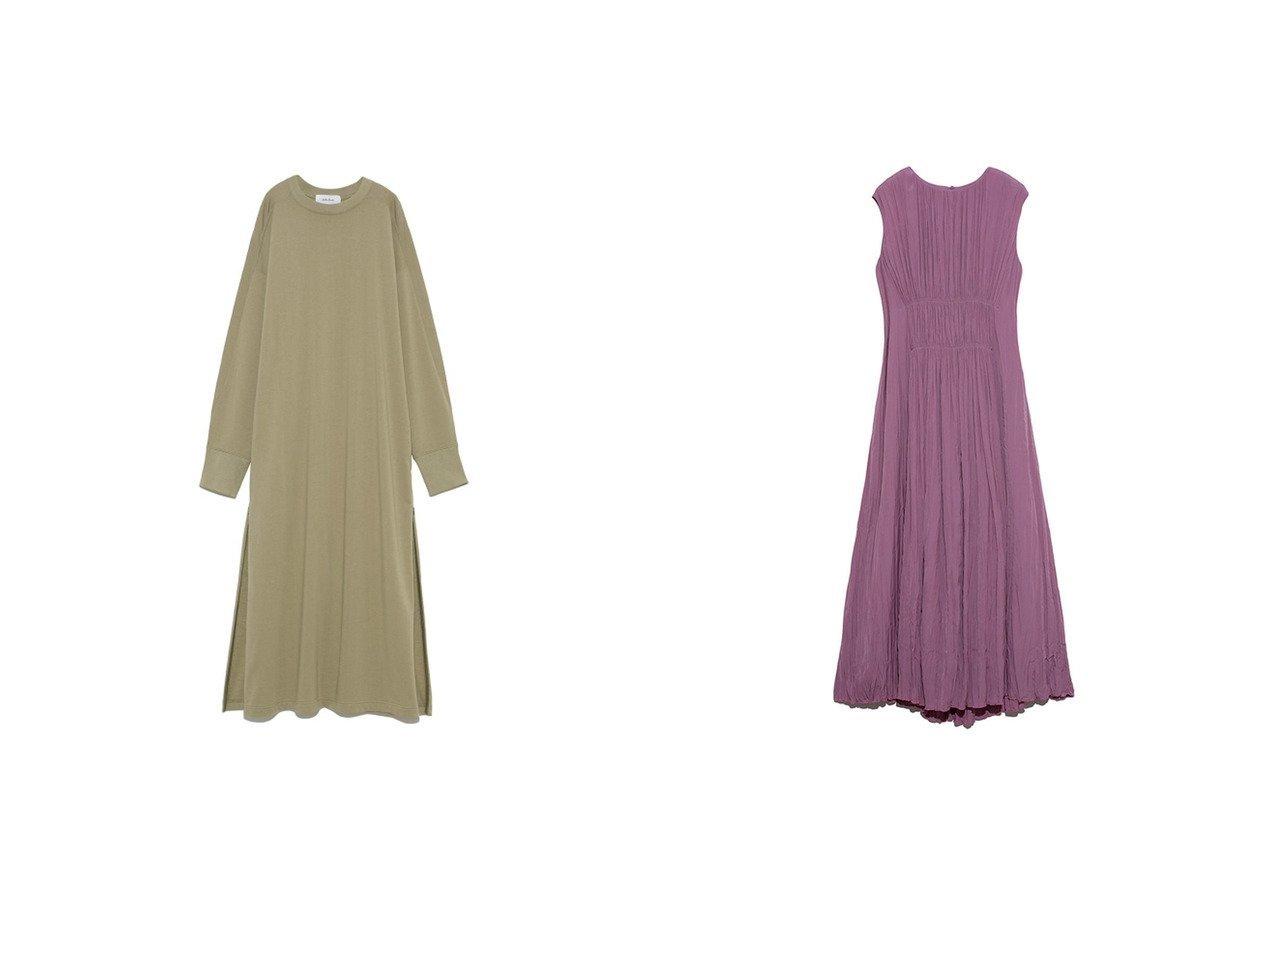 【Mila Owen/ミラオーウェン】のウエストシャーリングワッシャーワンピース&脇ファスナーミニ裏毛ロングTワンピース ワンピース・ドレスのおすすめ!人気、トレンド・レディースファッションの通販  おすすめで人気の流行・トレンド、ファッションの通販商品 メンズファッション・キッズファッション・インテリア・家具・レディースファッション・服の通販 founy(ファニー) https://founy.com/ ファッション Fashion レディースファッション WOMEN ワンピース Dress シンプル スウェット スキニー スタンダード スマート スリット スリーブ ロング シルク デニム レギンス ワッシャー 雑誌 |ID:crp329100000010240